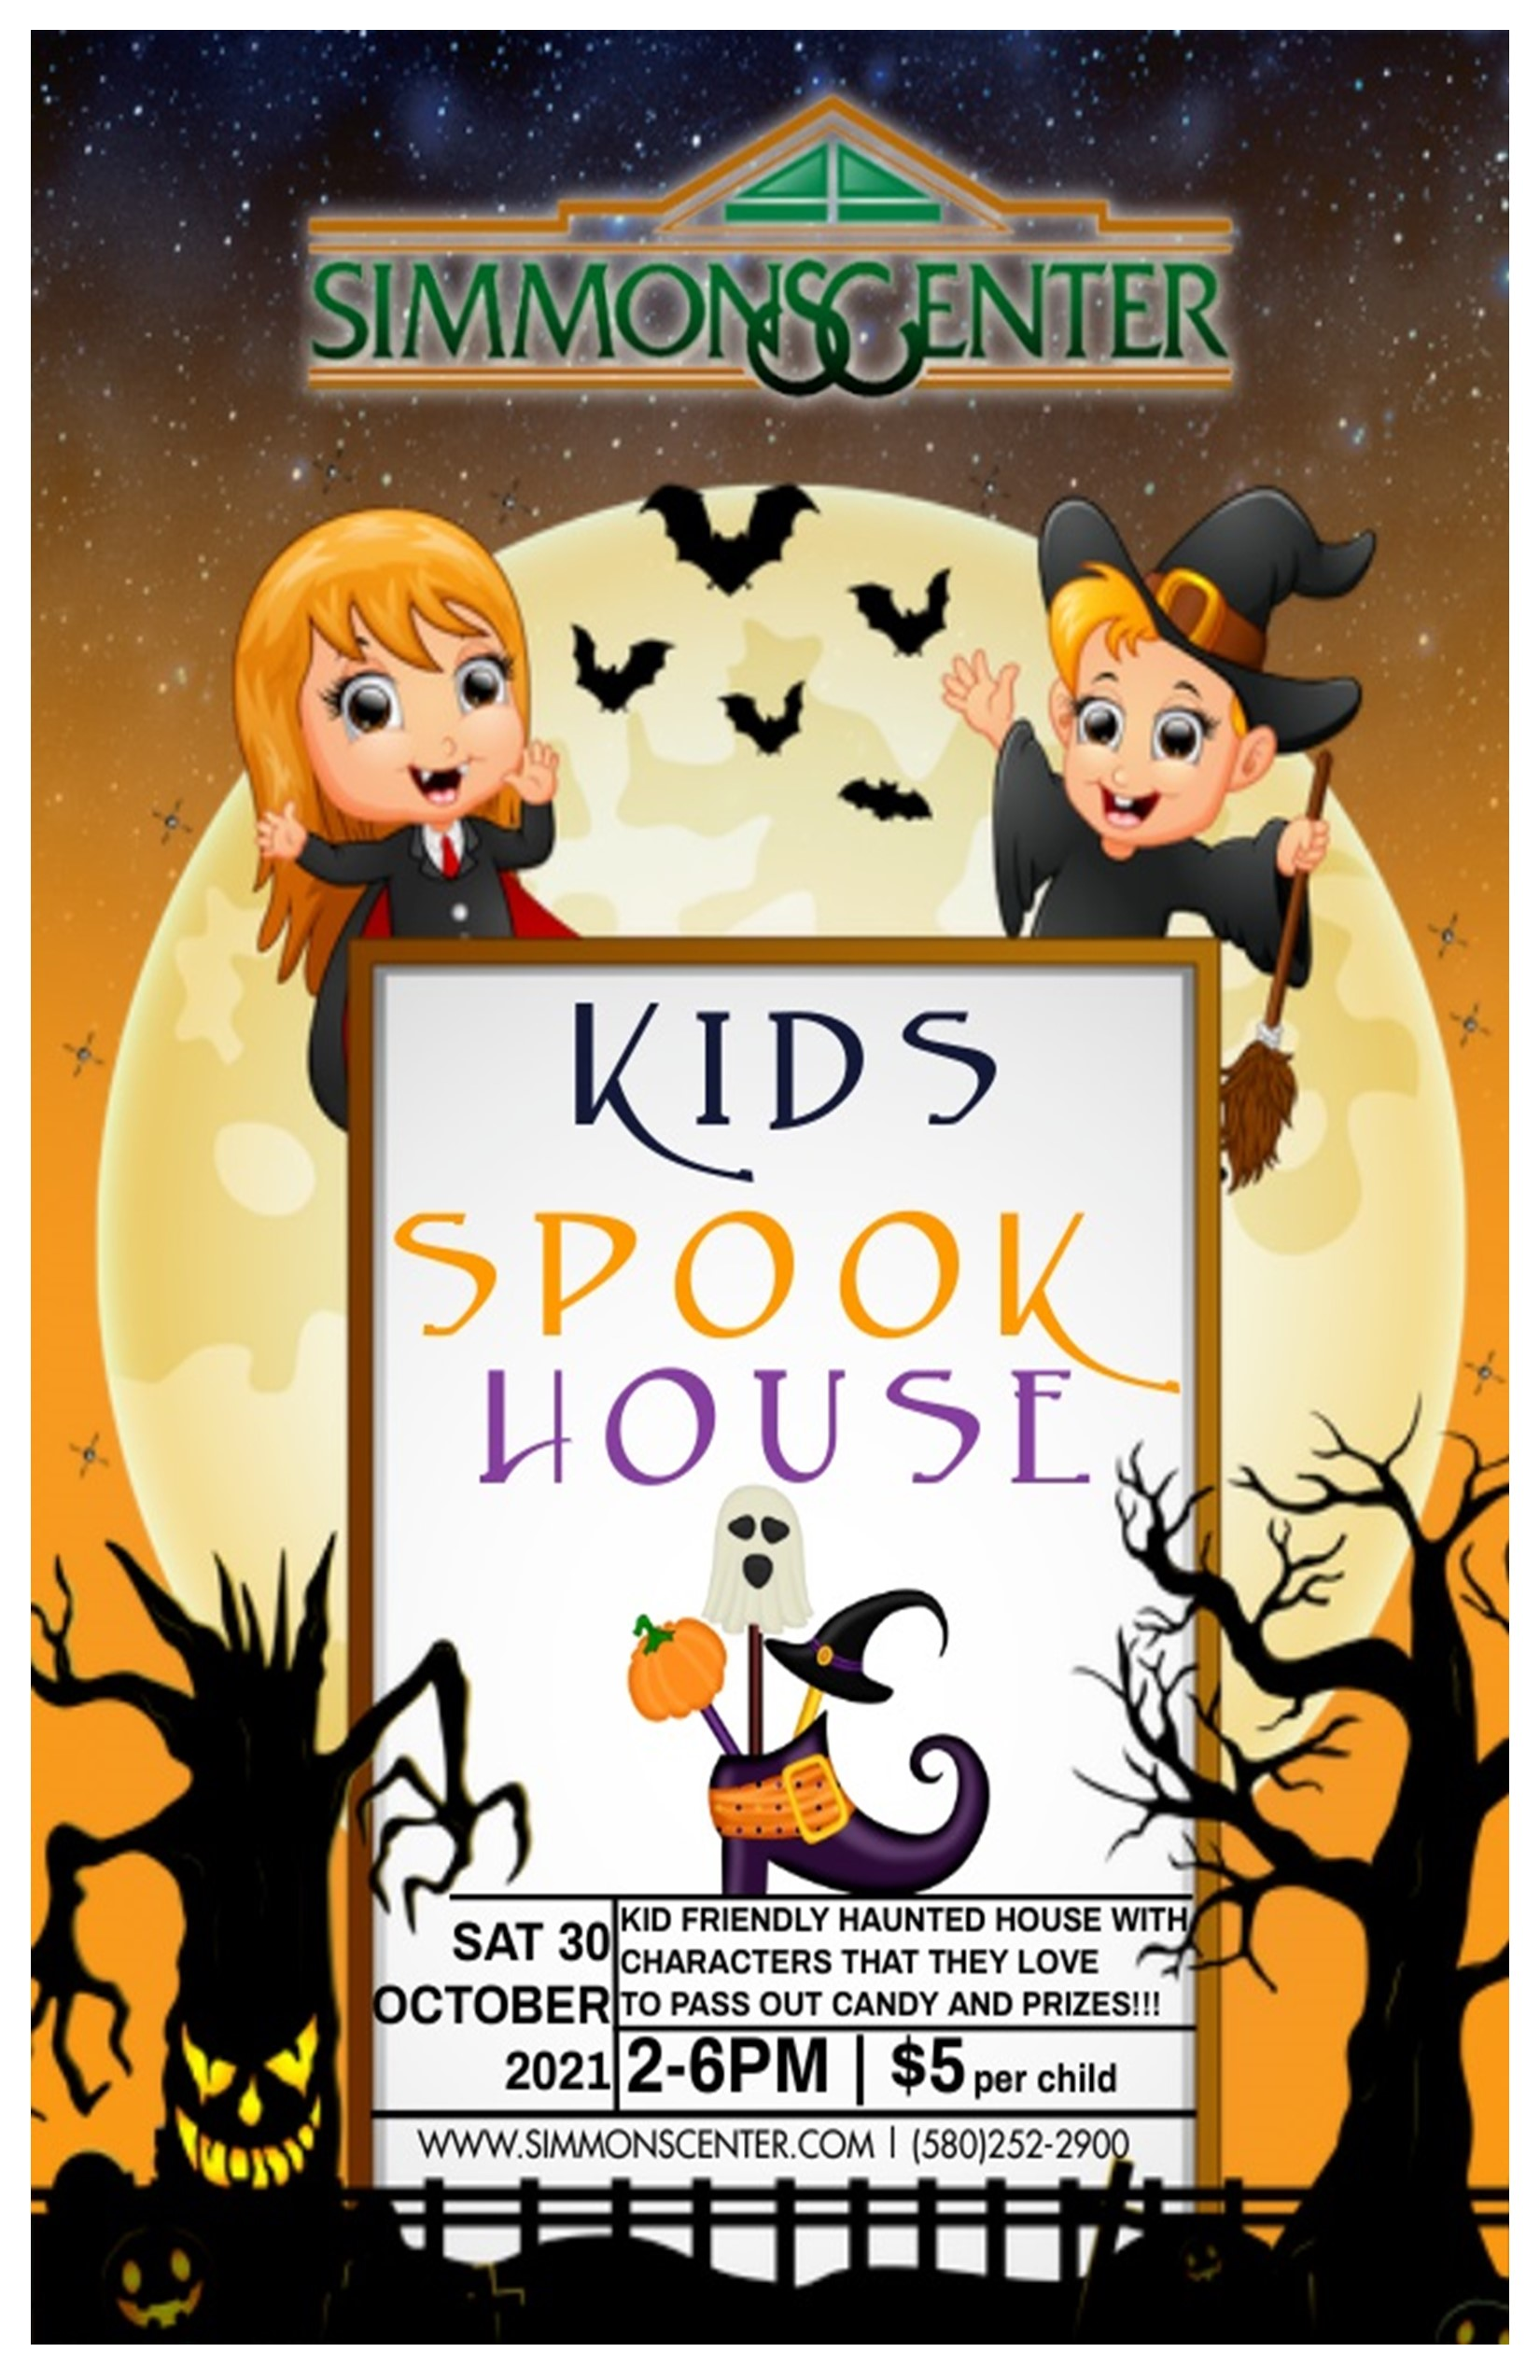 Kids Spook House 2021